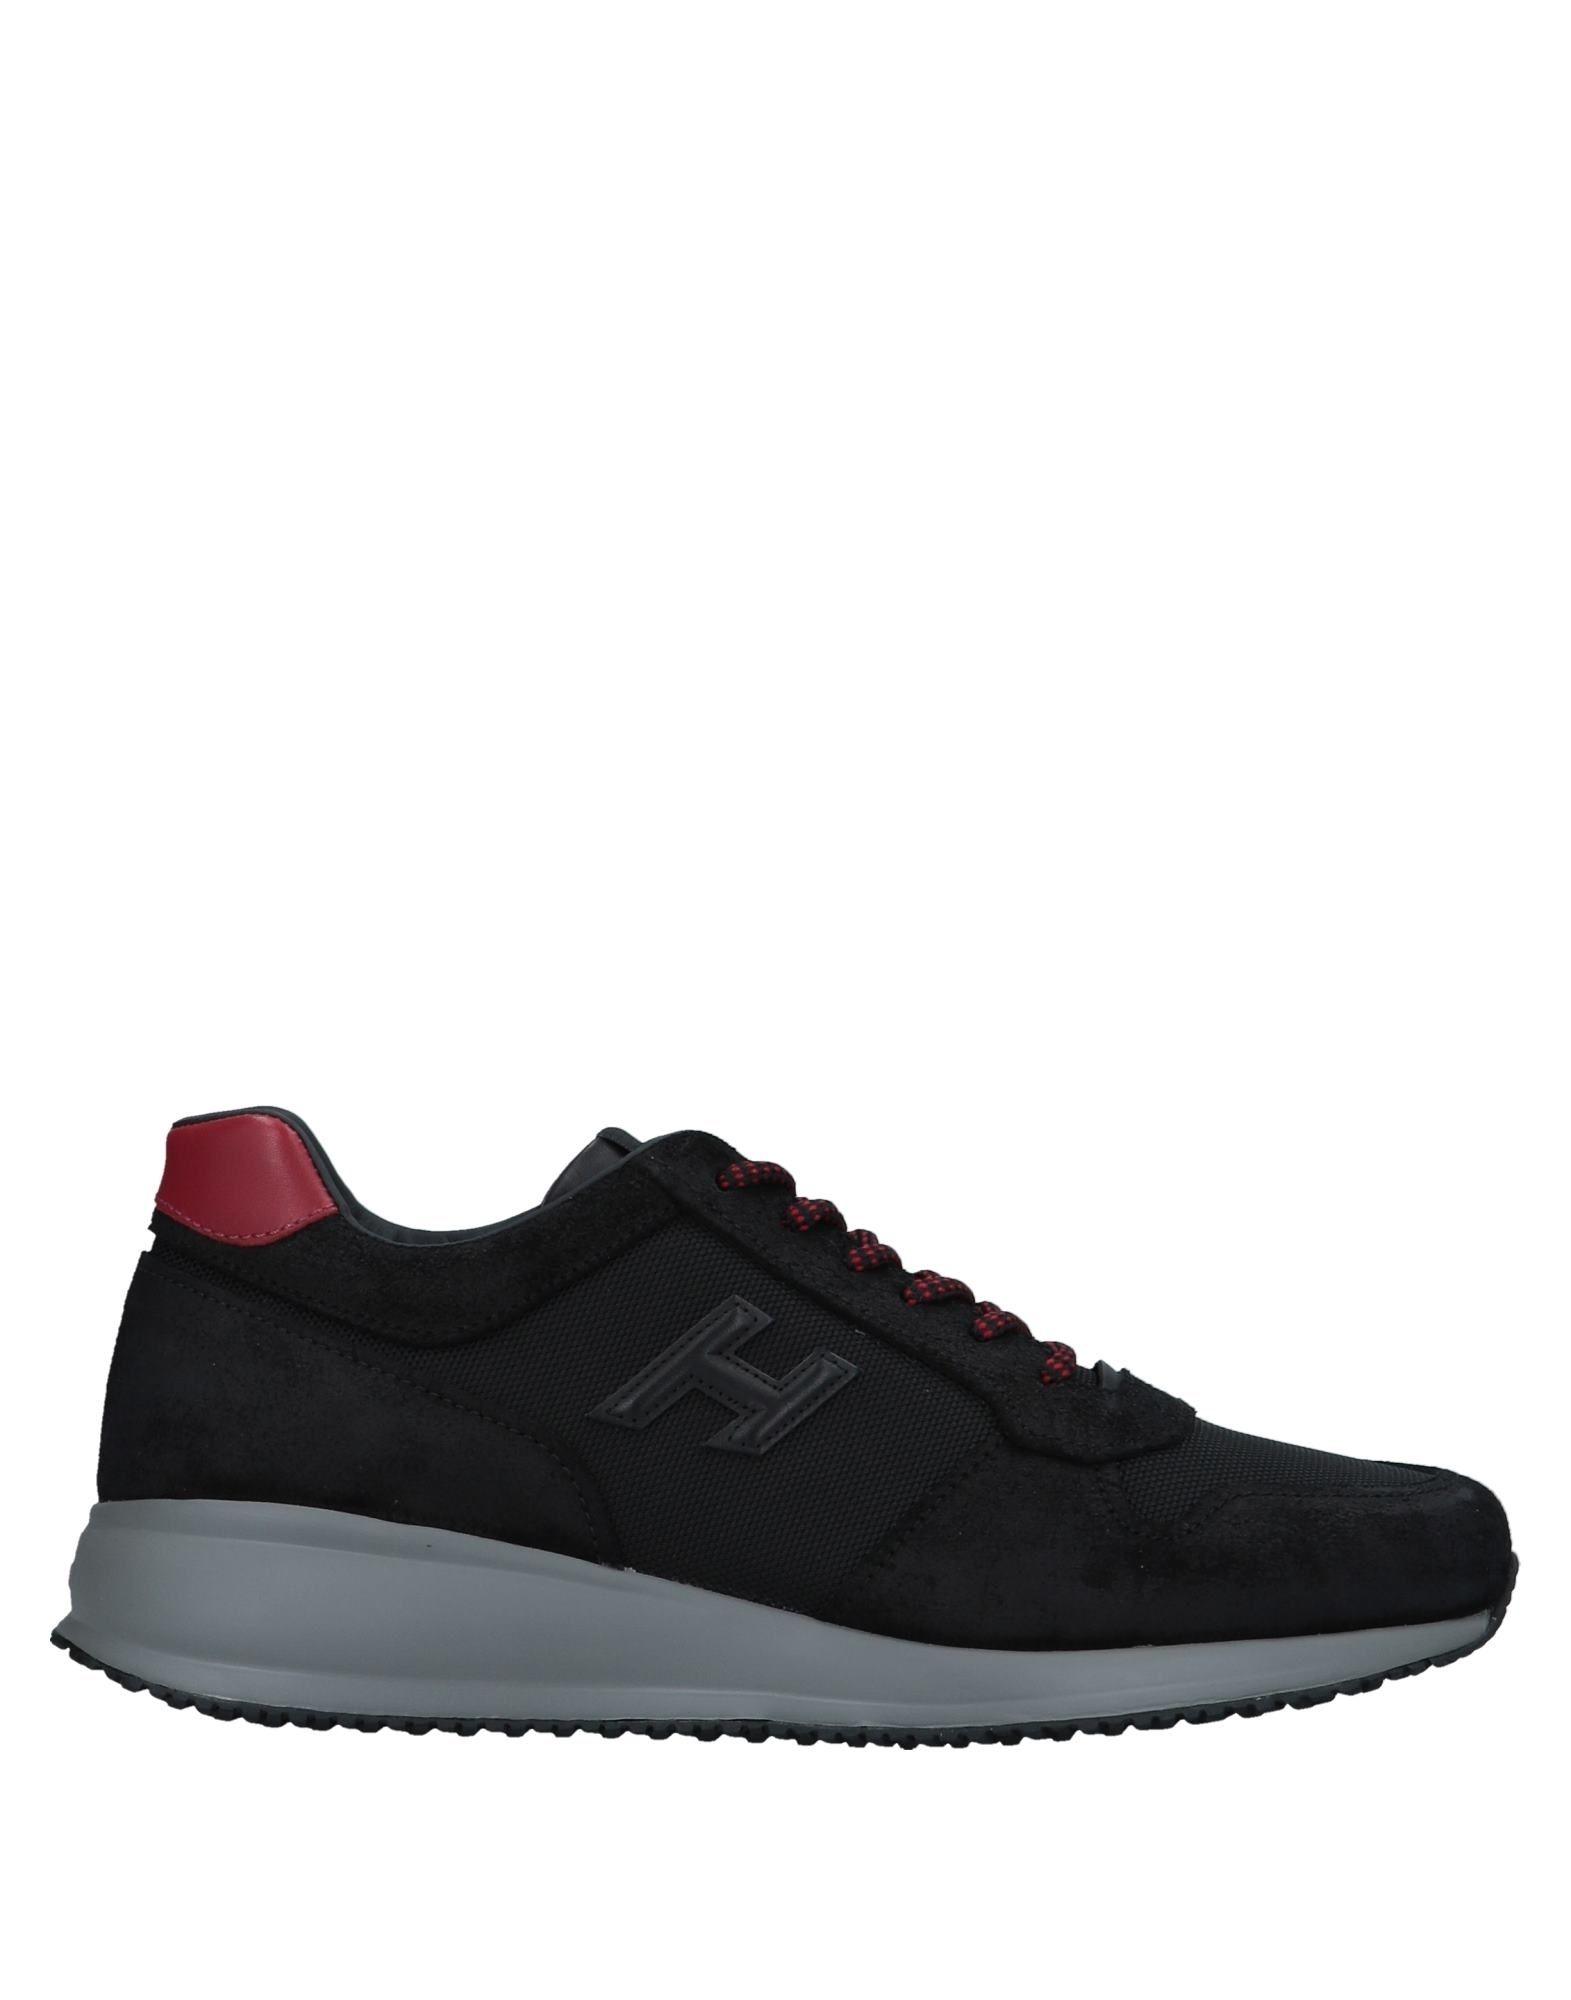 Hogan Sneakers Herren  11542766SN Gute Qualität beliebte Schuhe